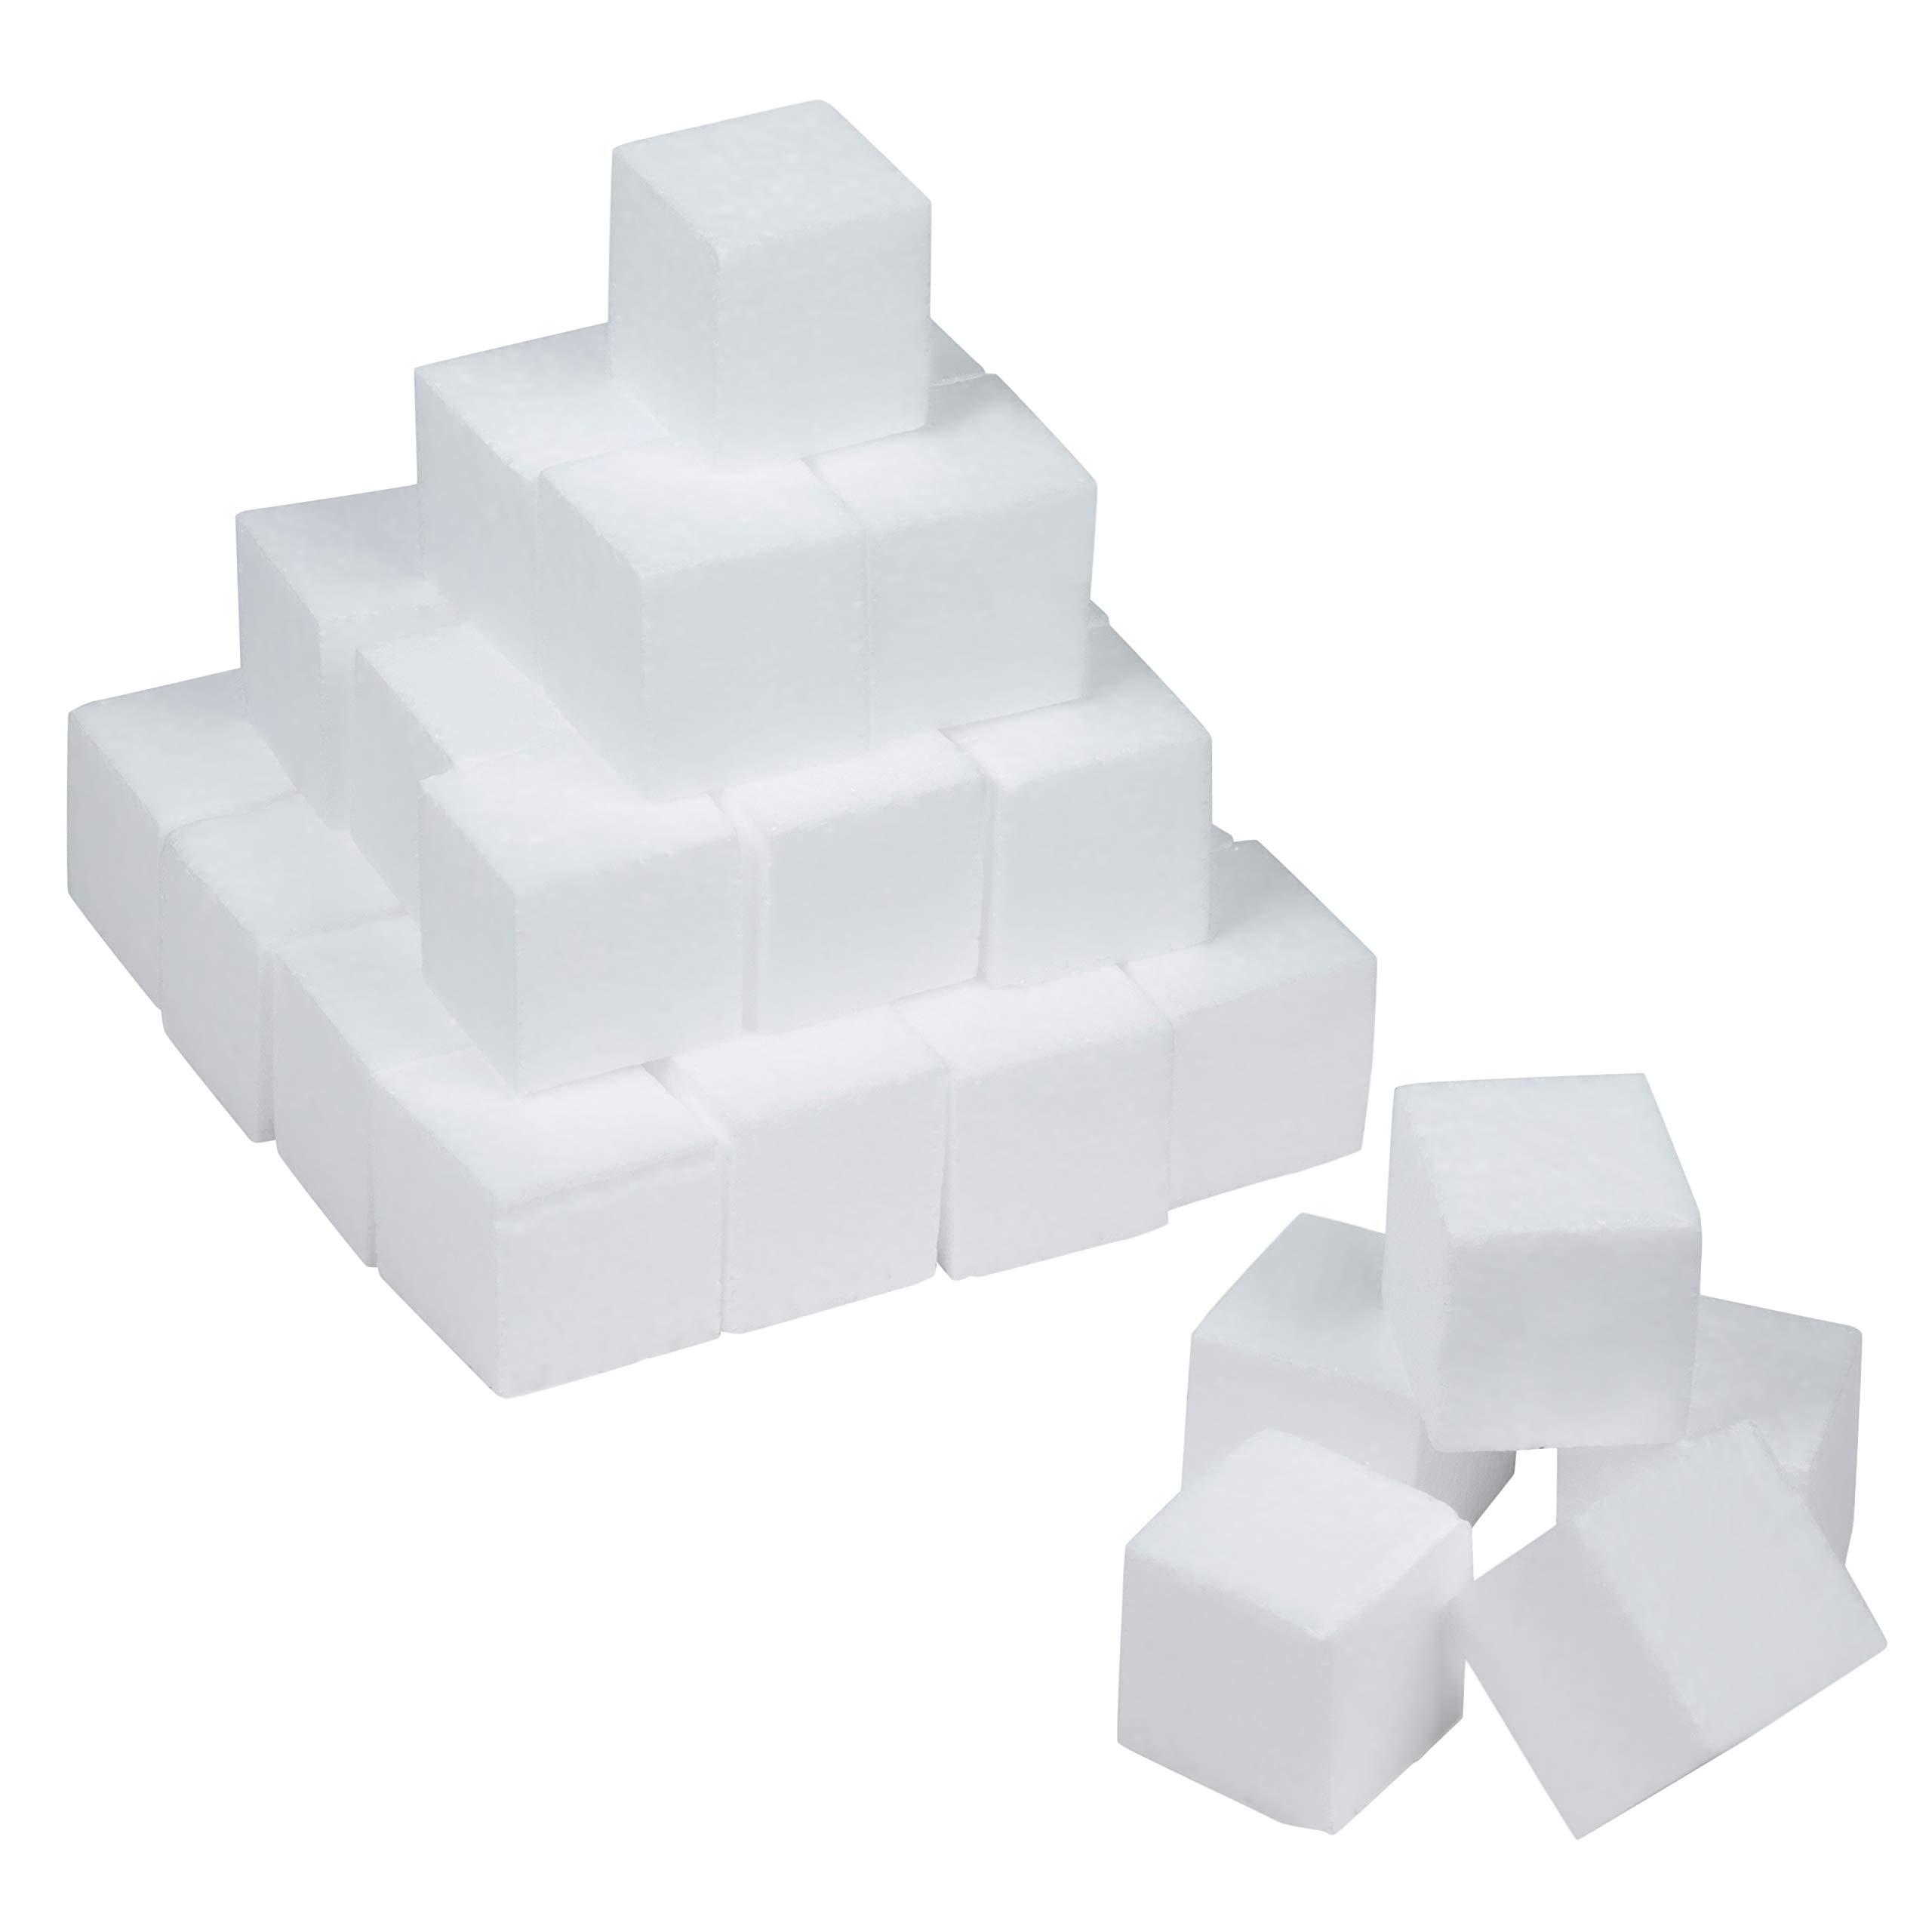 Craft Foam Blocks - 36-Piece Polystyrene Foam Blocks for Crafts and Modeling, 2 x 2 x 2 Inches Blank Craft Foam by Genie Crafts (Image #1)